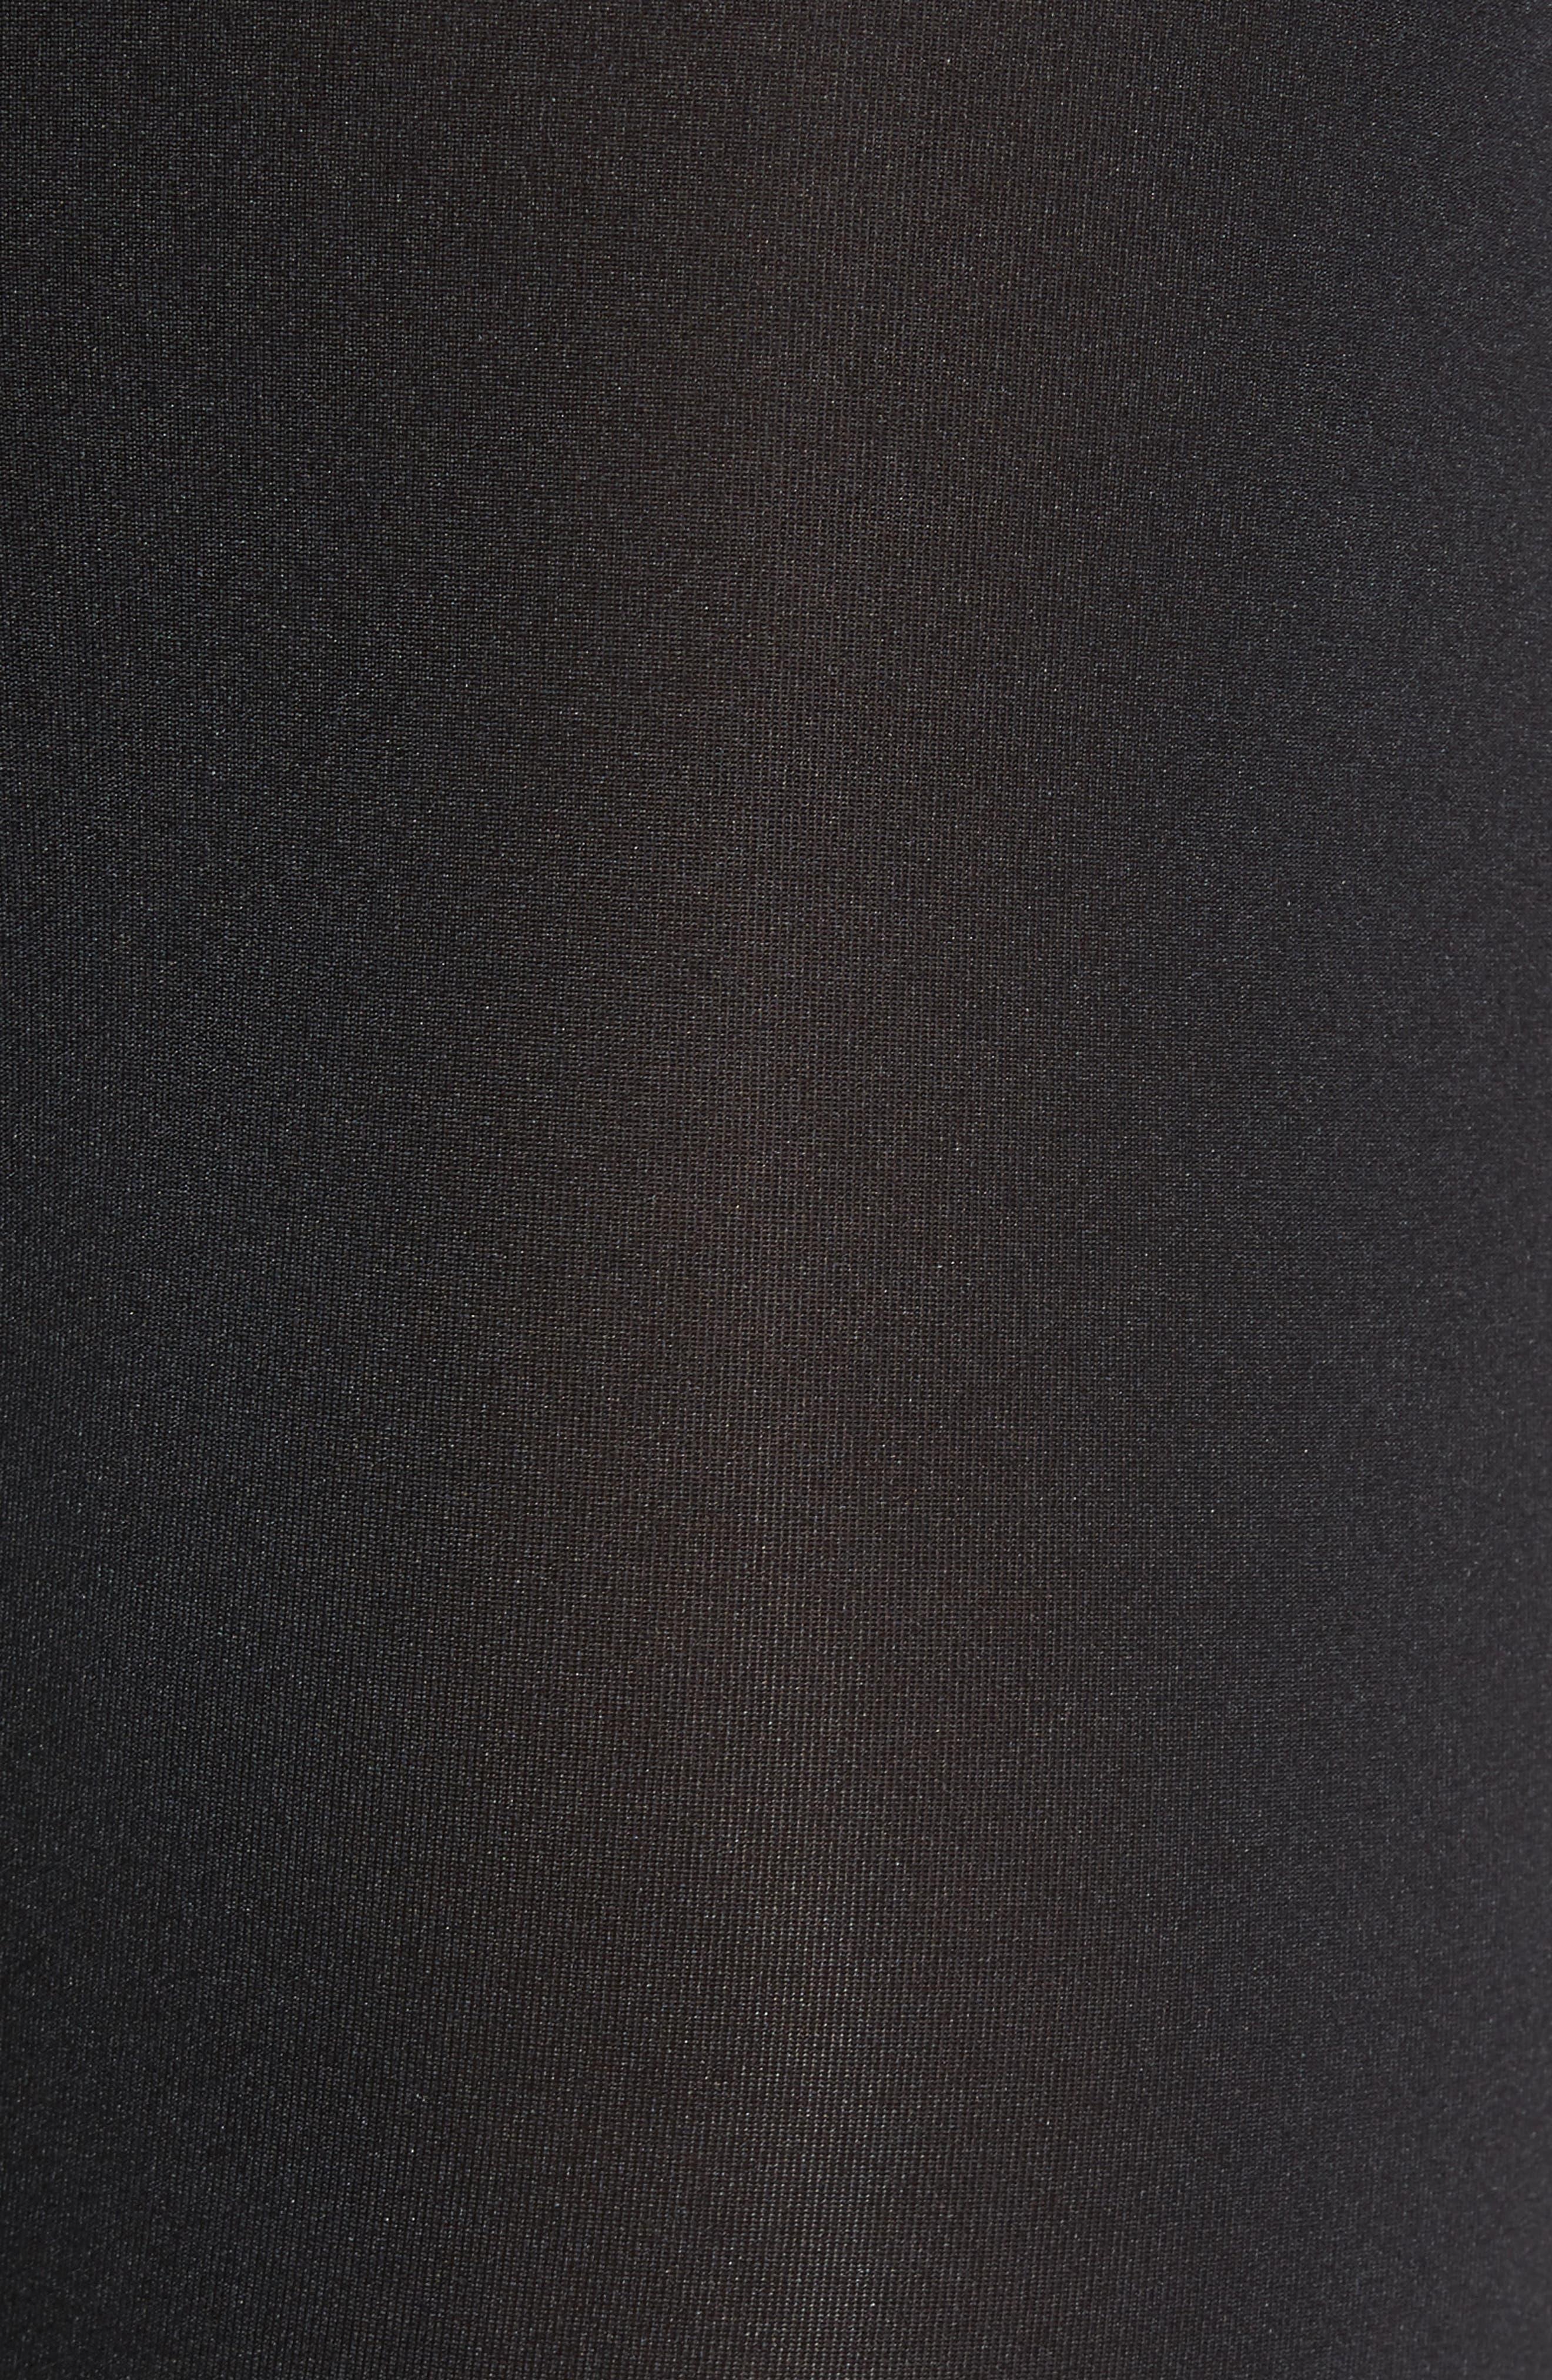 Pro Compression Shorts,                             Alternate thumbnail 13, color,